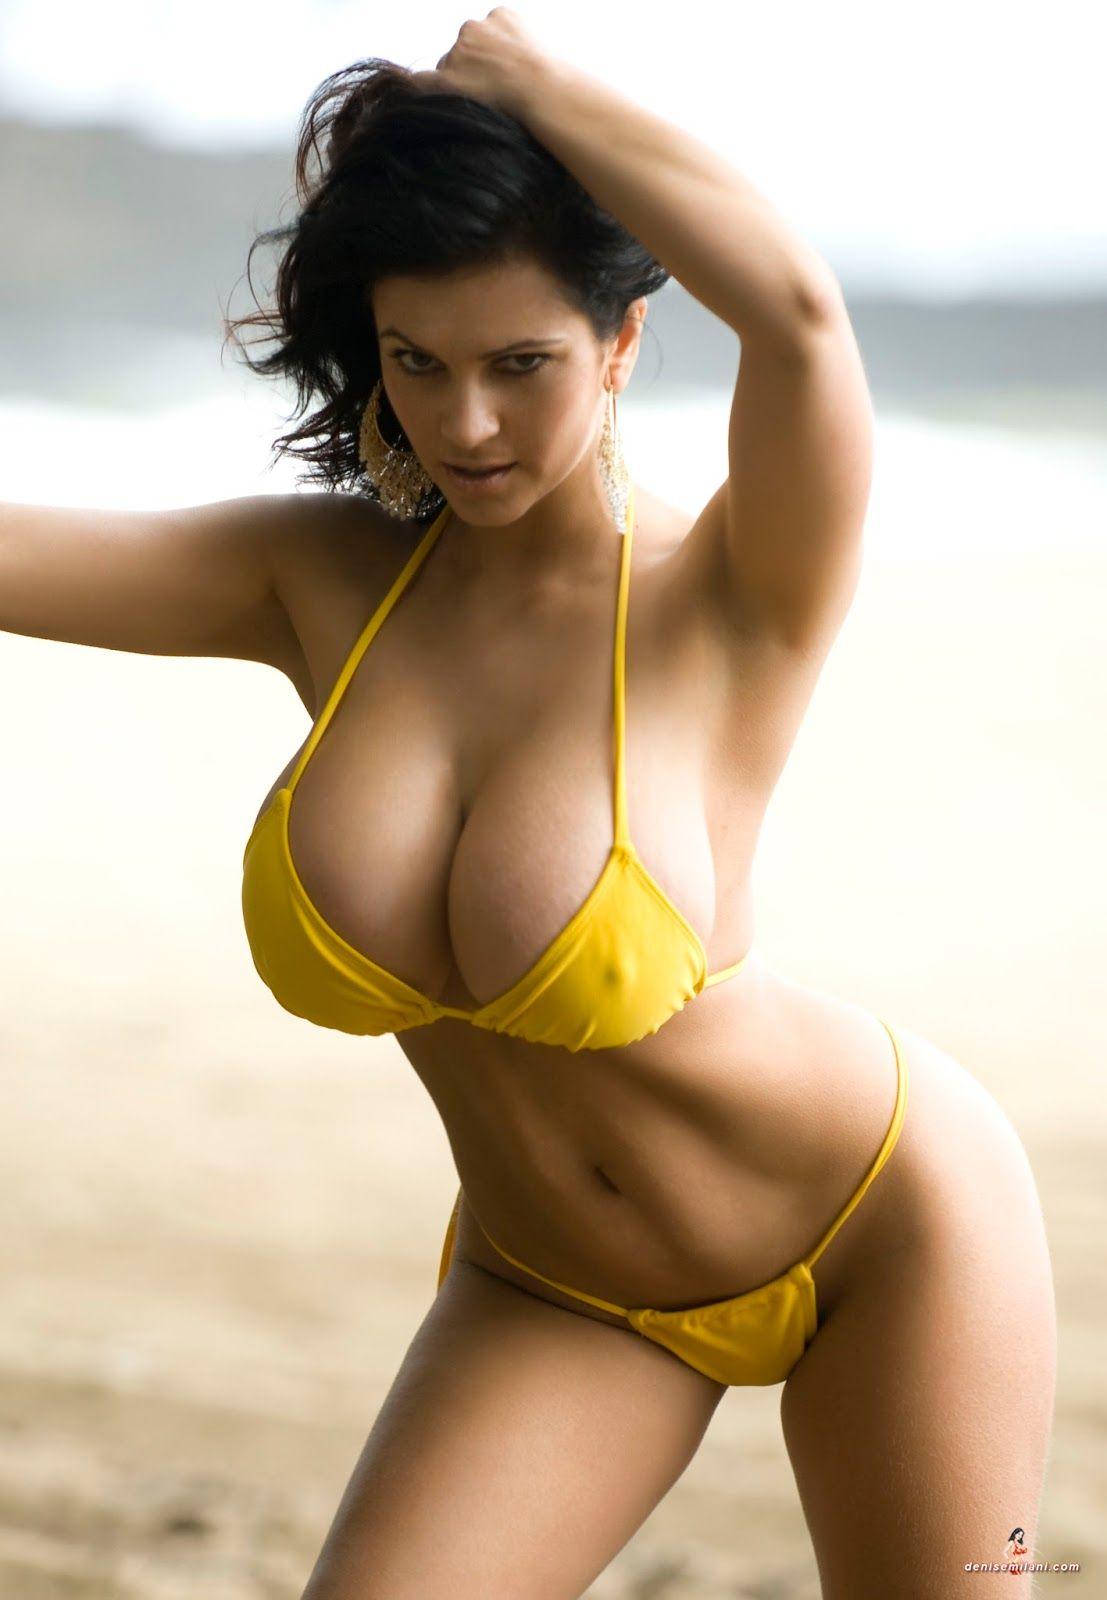 Nude midget girls sex